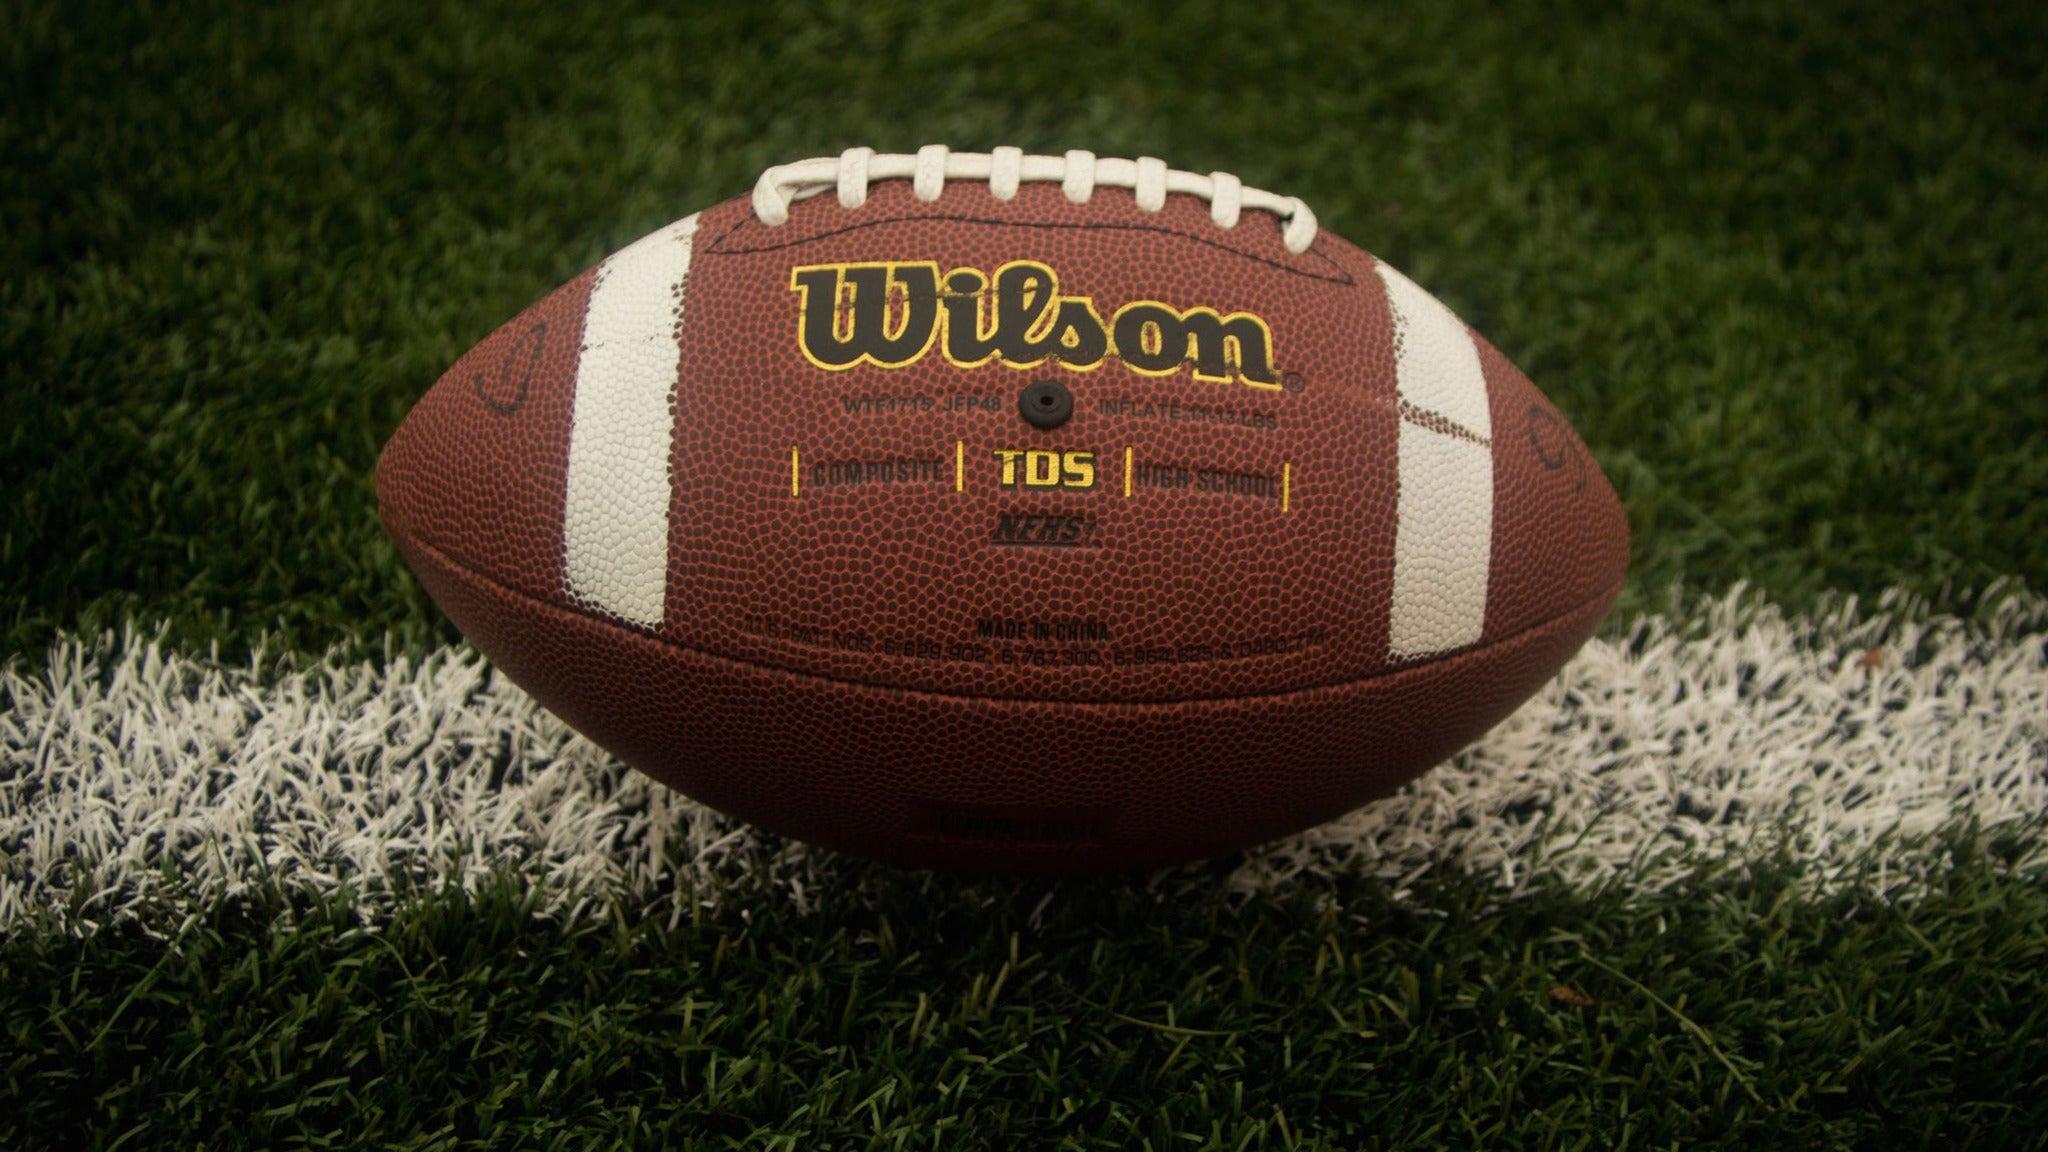 Cincinnati Bearcats Football vs. UCF Knights Football